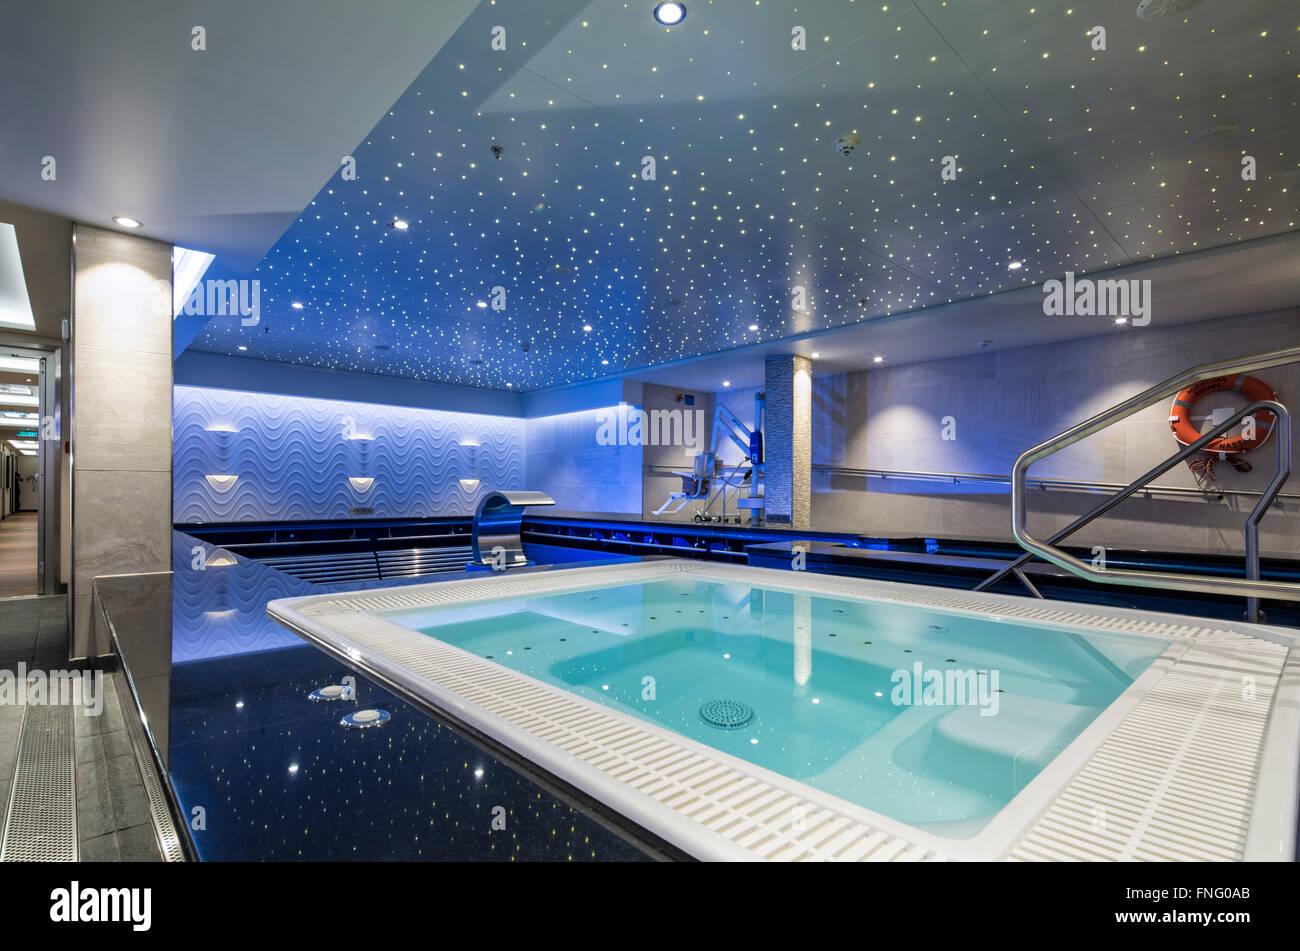 Spa Swimming Pool Sports Basin Small Jacuzzi Hydro Handrail Steps ...